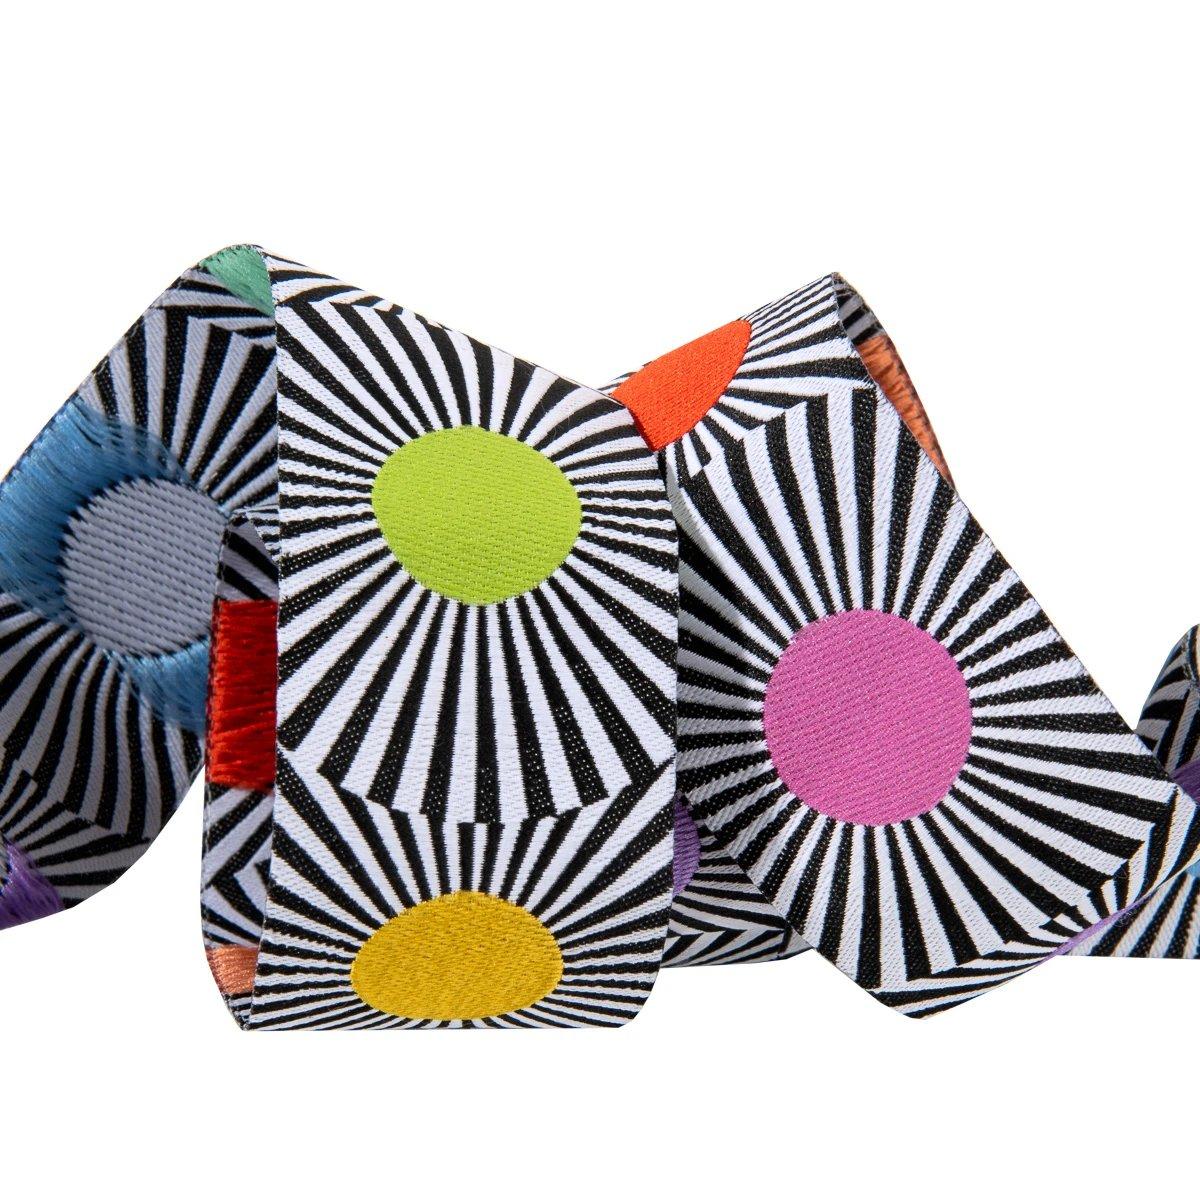 Tula Pink Ribbon - Linework - 1.5in Wide Multi Dots TK-6238-C1